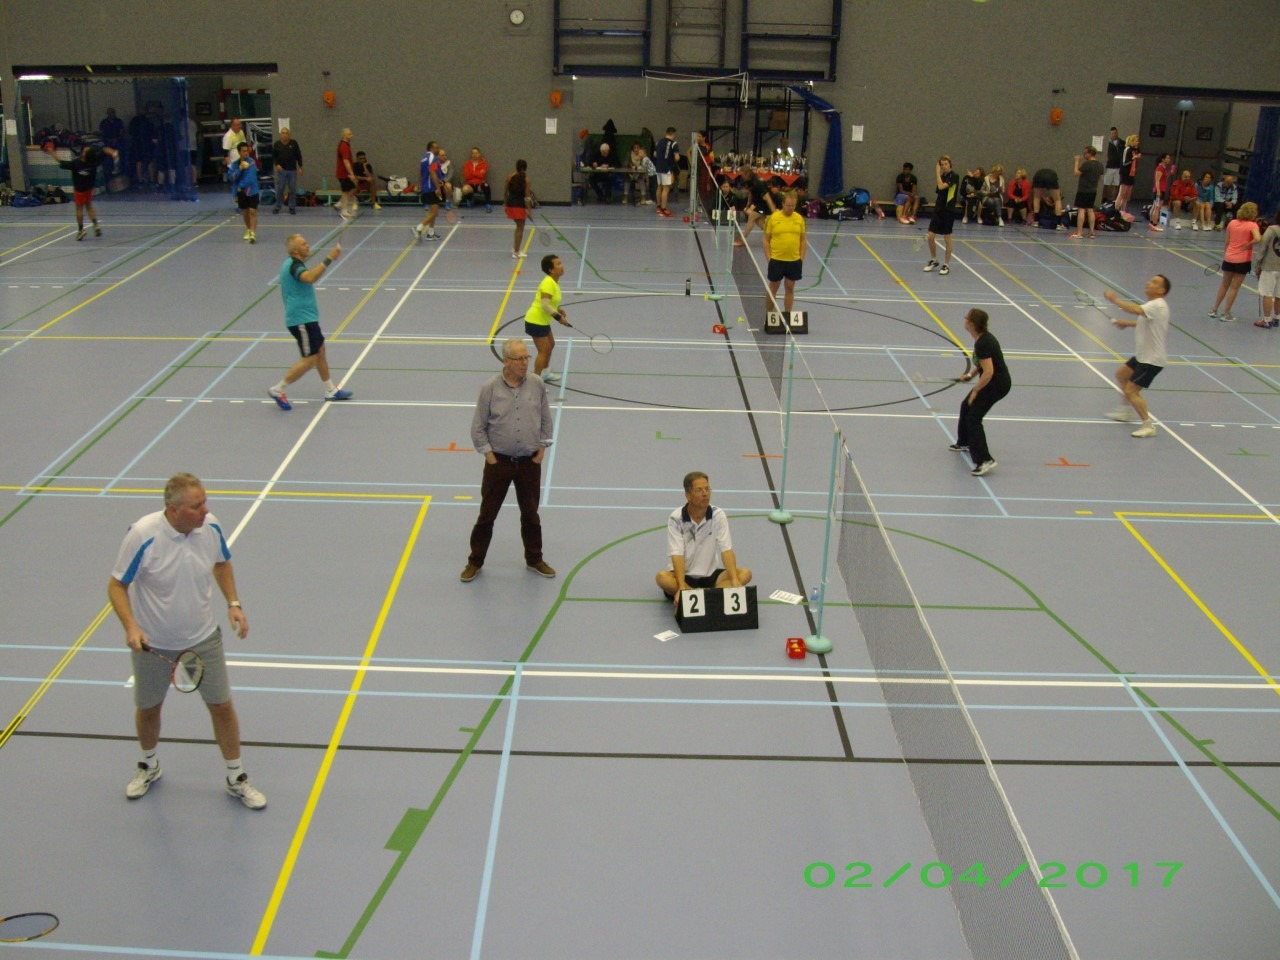 Nieuwkomer pakt wisselbeker Recreatief Badminton Toernooi ... Badminton Toernooi Nl